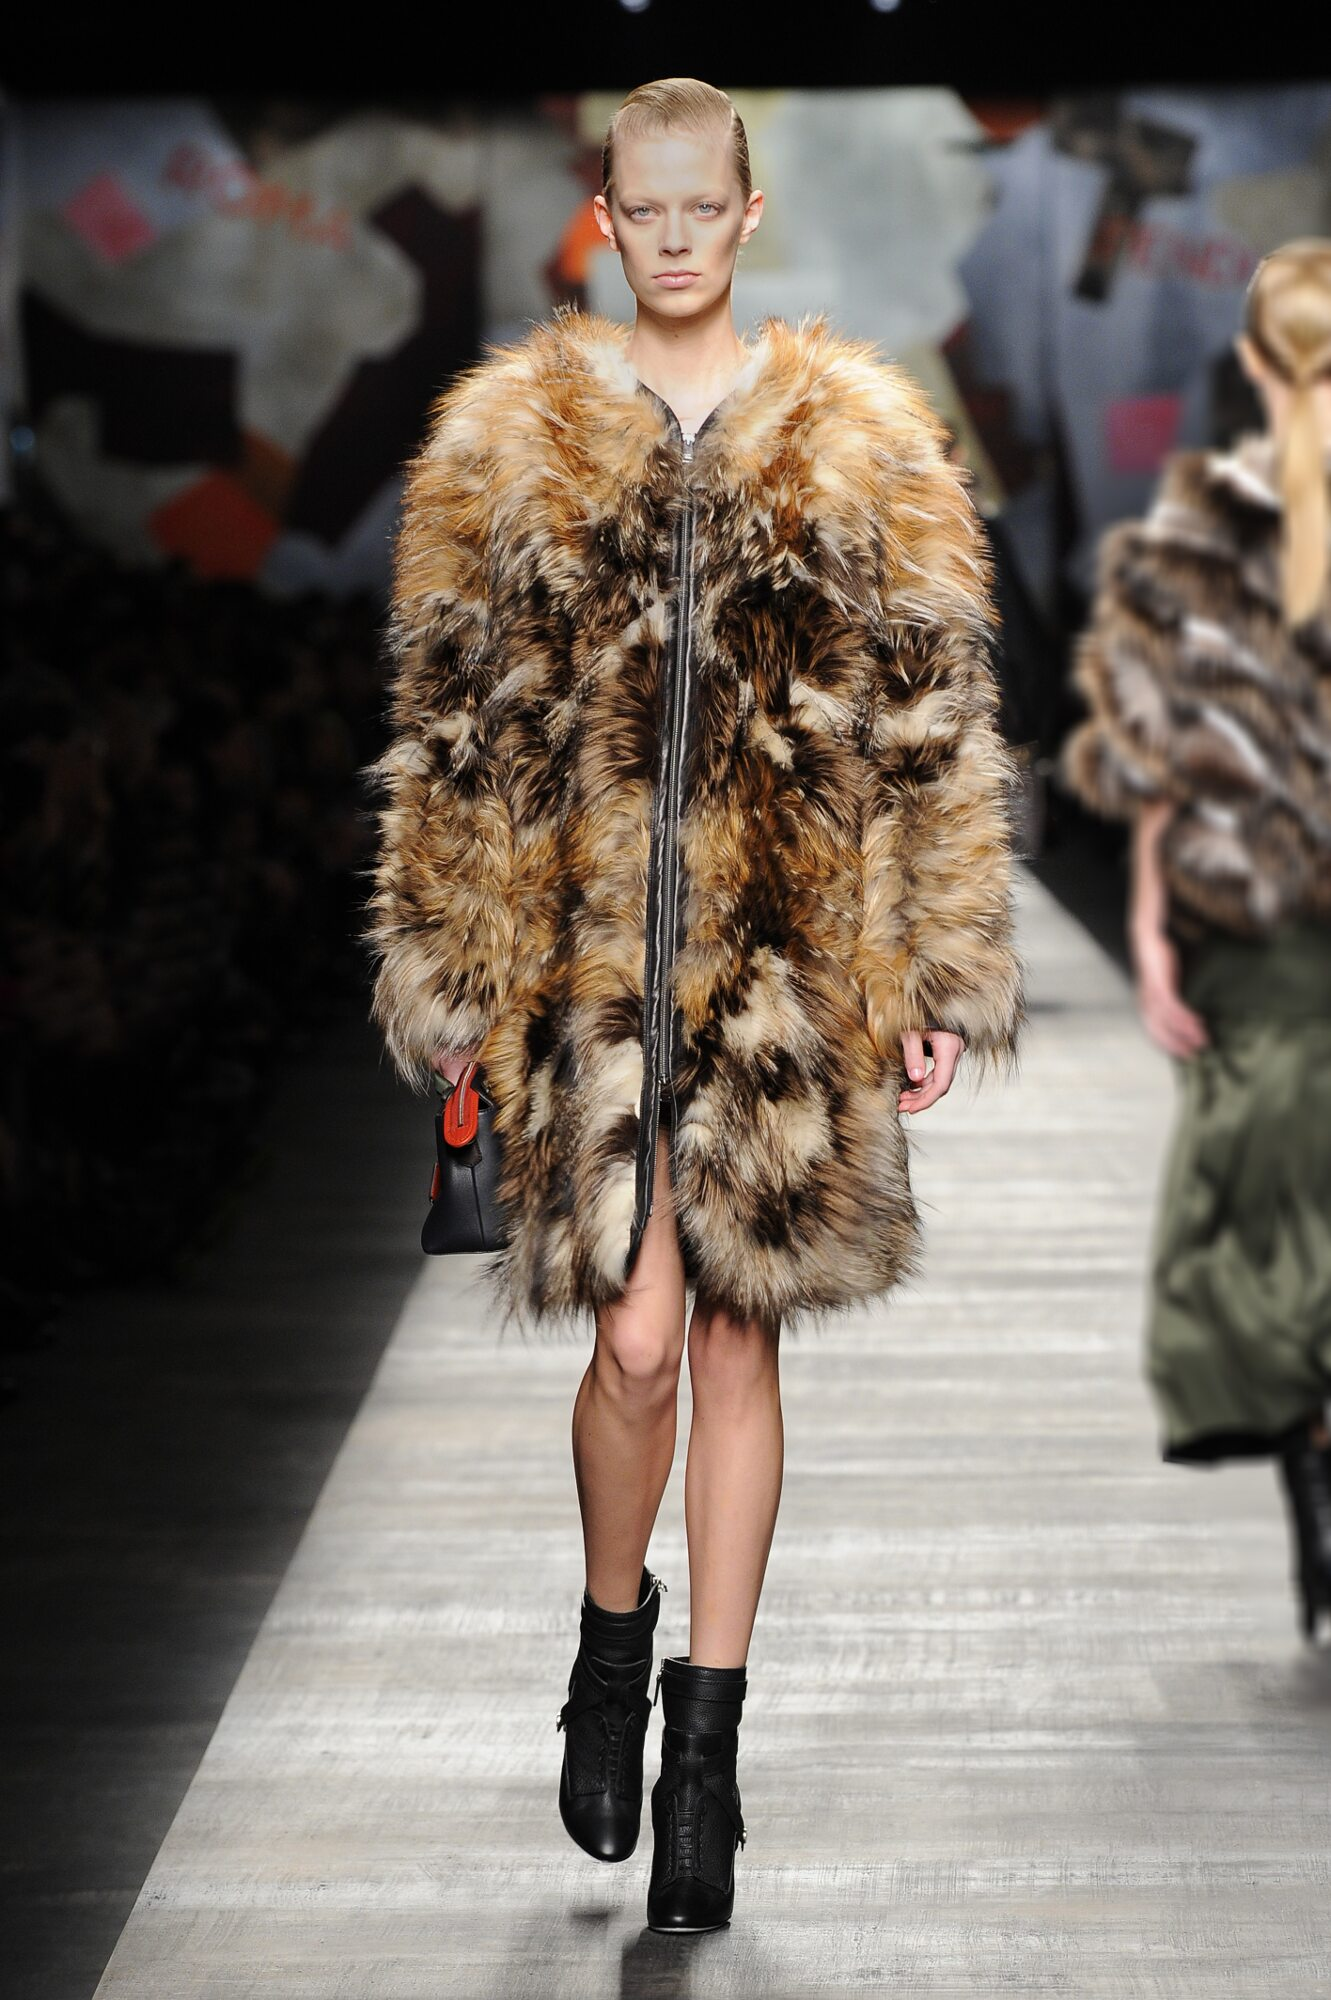 Catwalk Fendi Fashion Show Winter 2014